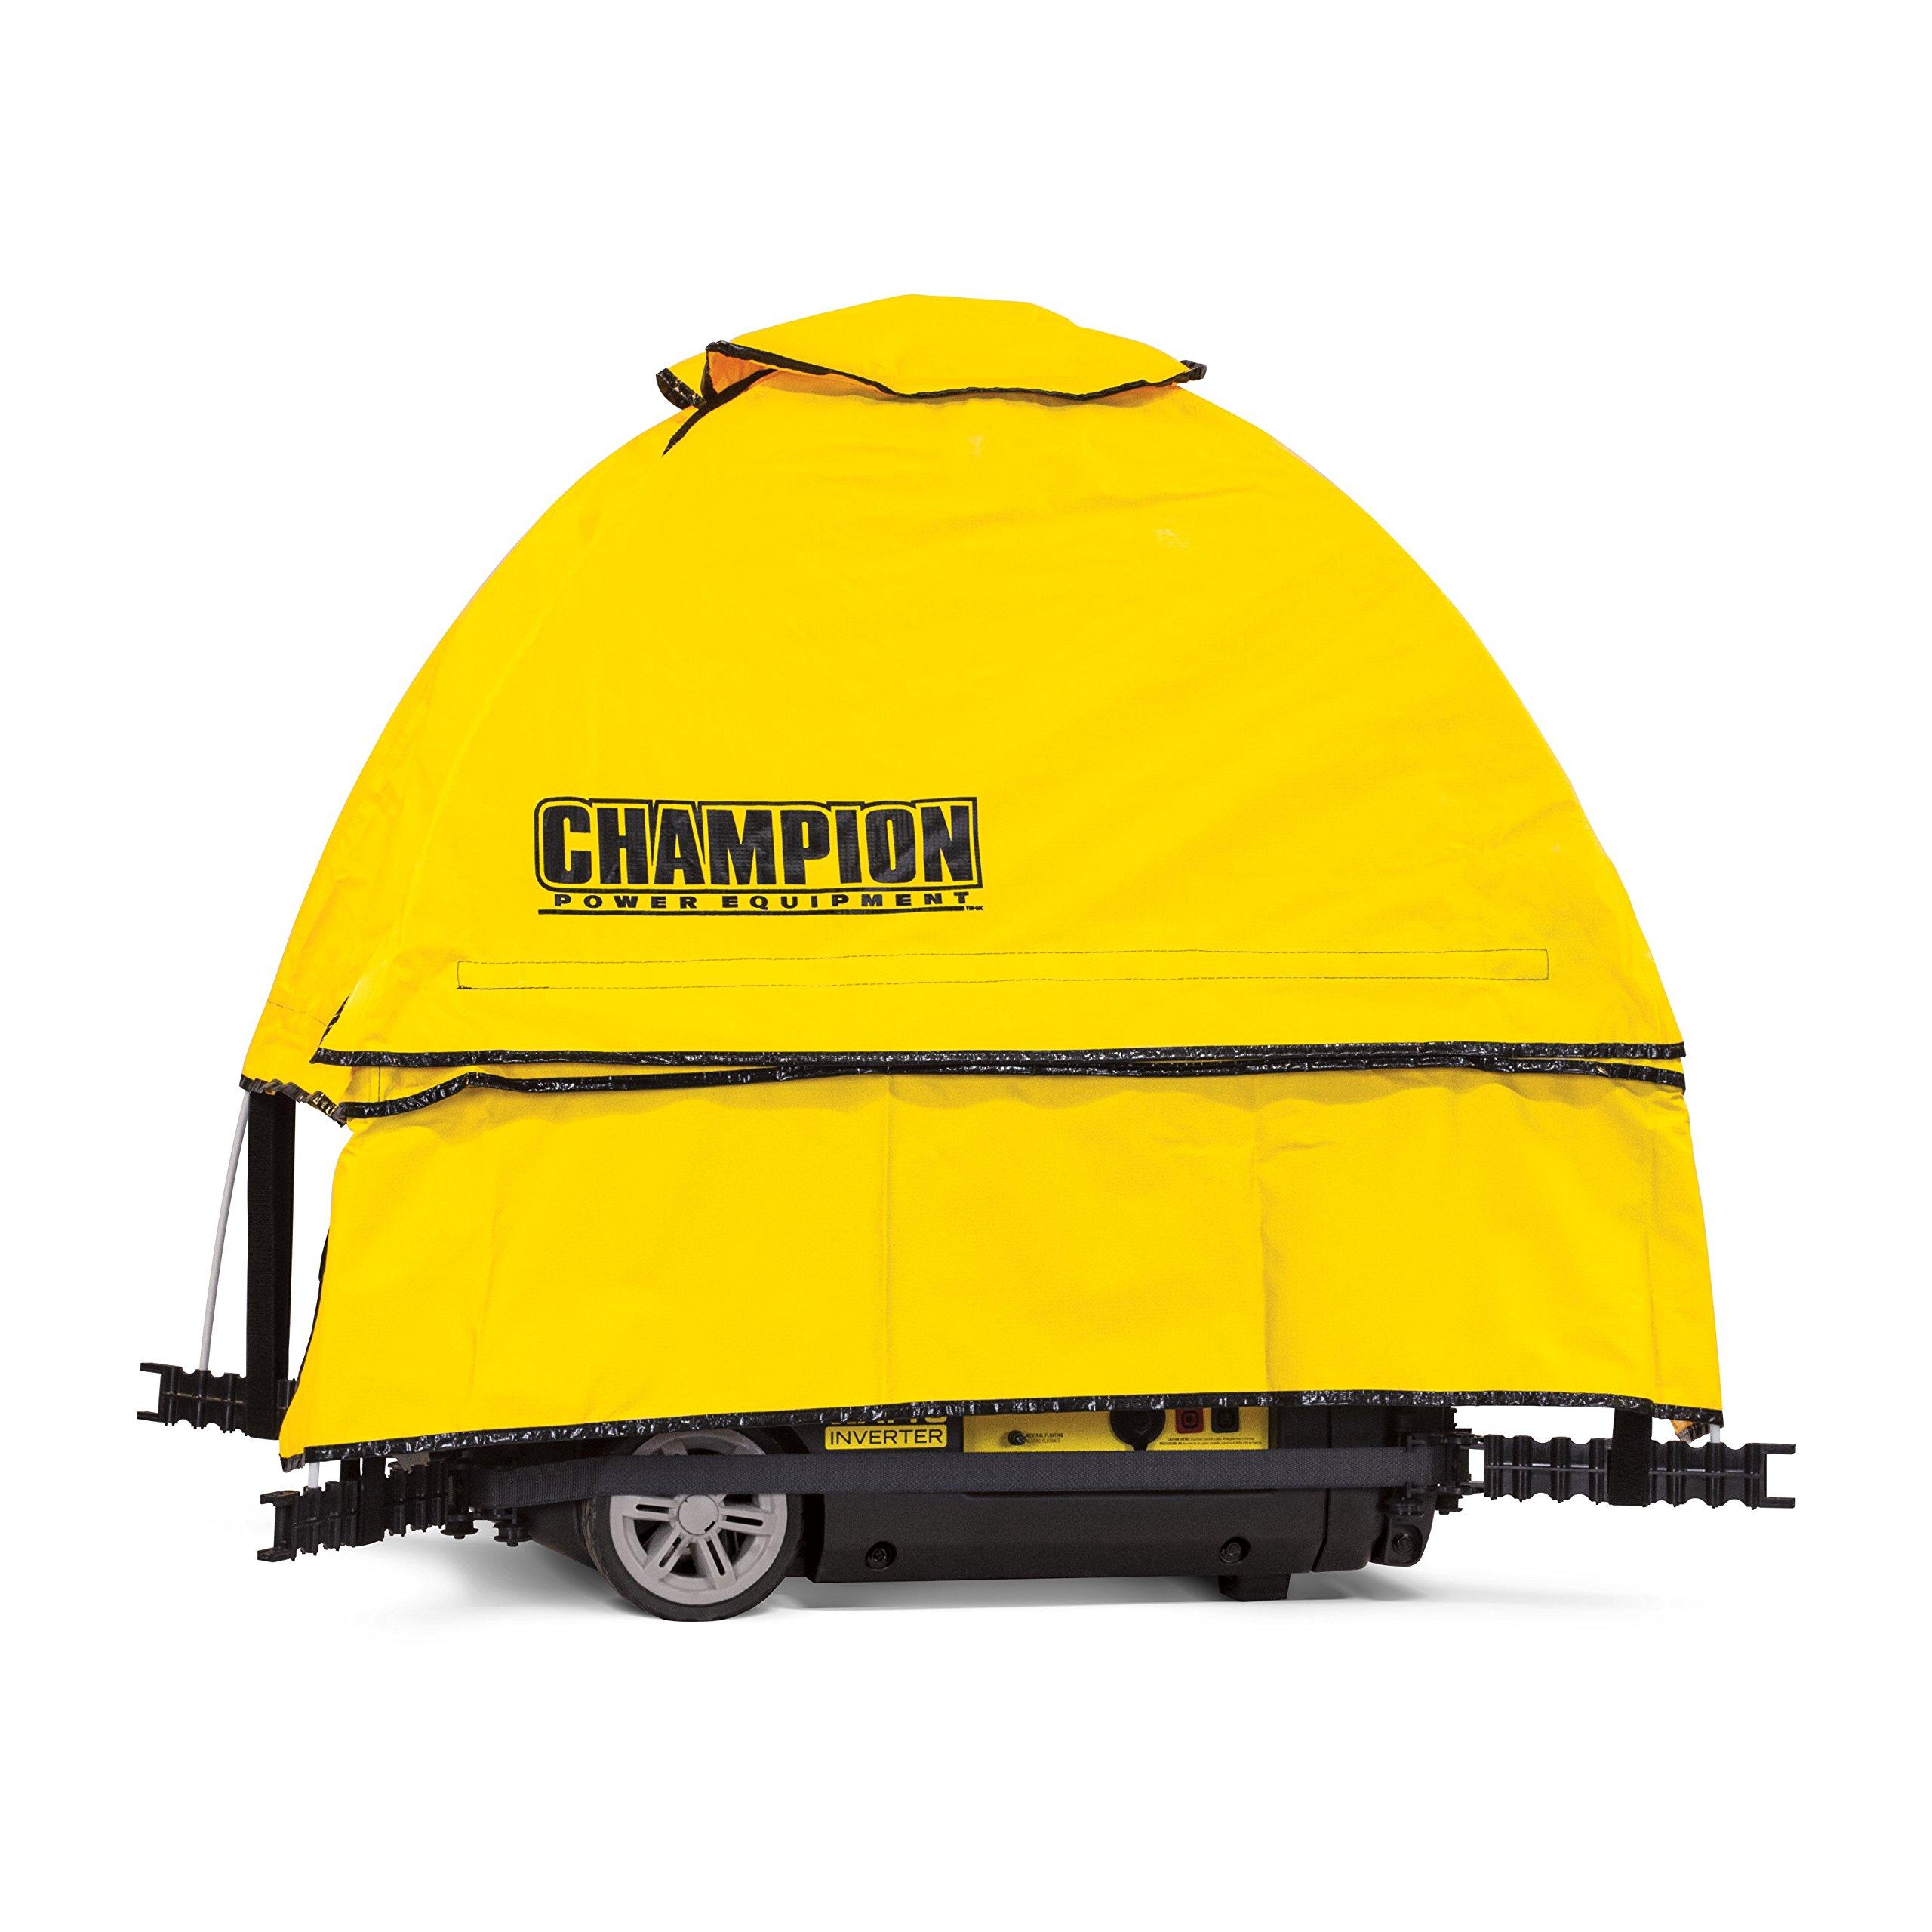 Champion Power Equipment 100603 Champion Portable Generator Cover, Yellow by Champion Power Equipment